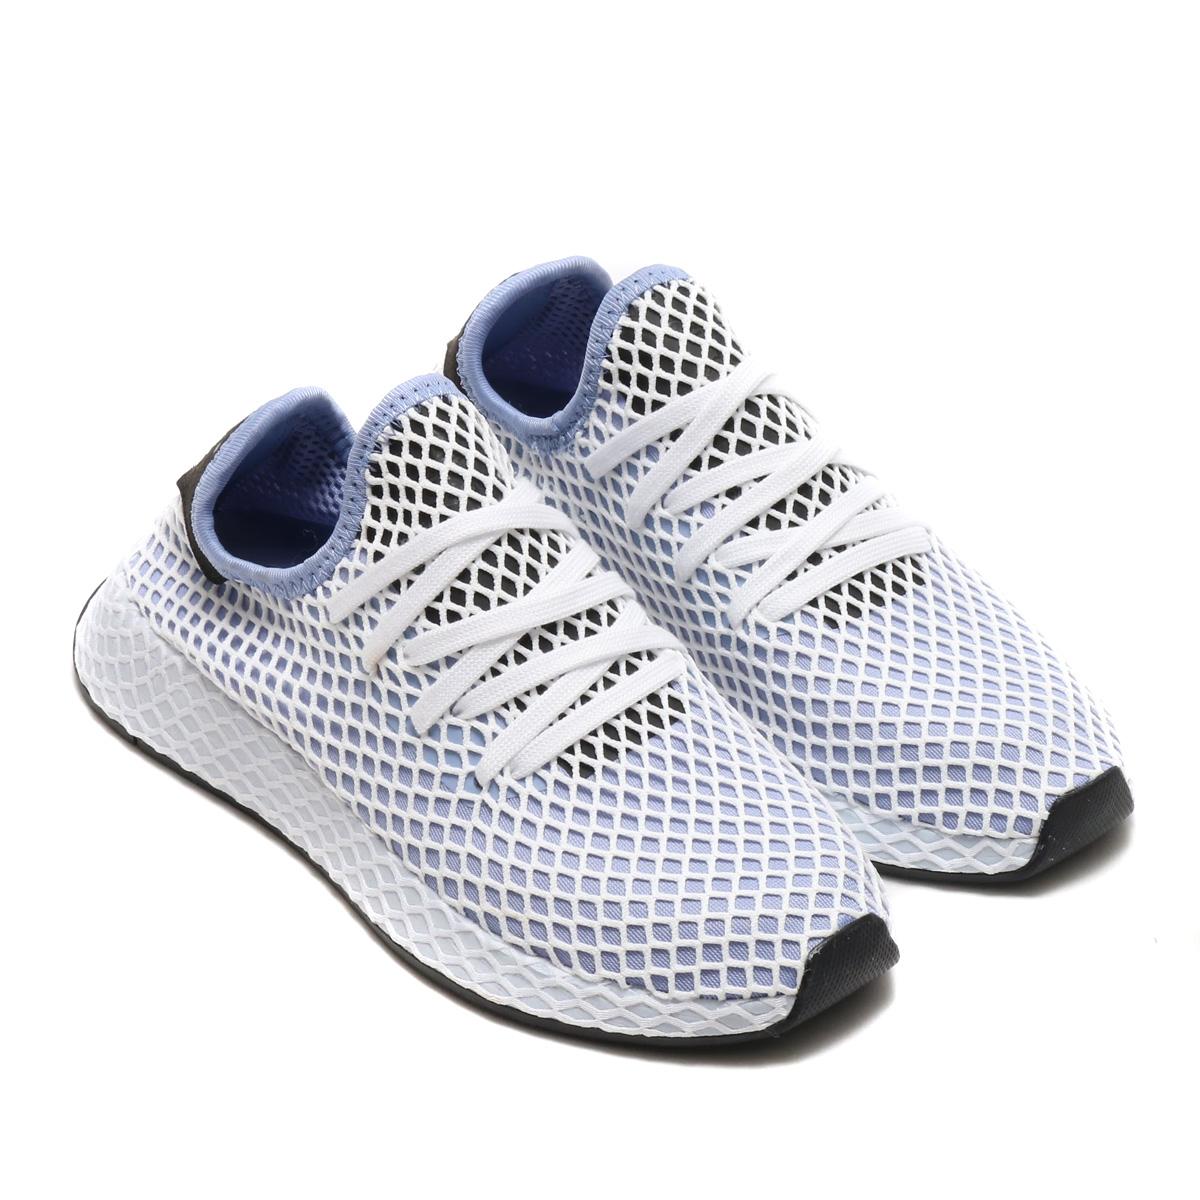 adidas Originals DEERUPT RUNNER W(アディダス オリジナルス ディーラプト ランナー W)(チョークブルー S18/チョークブルー S18/コアブラック)18SS-I